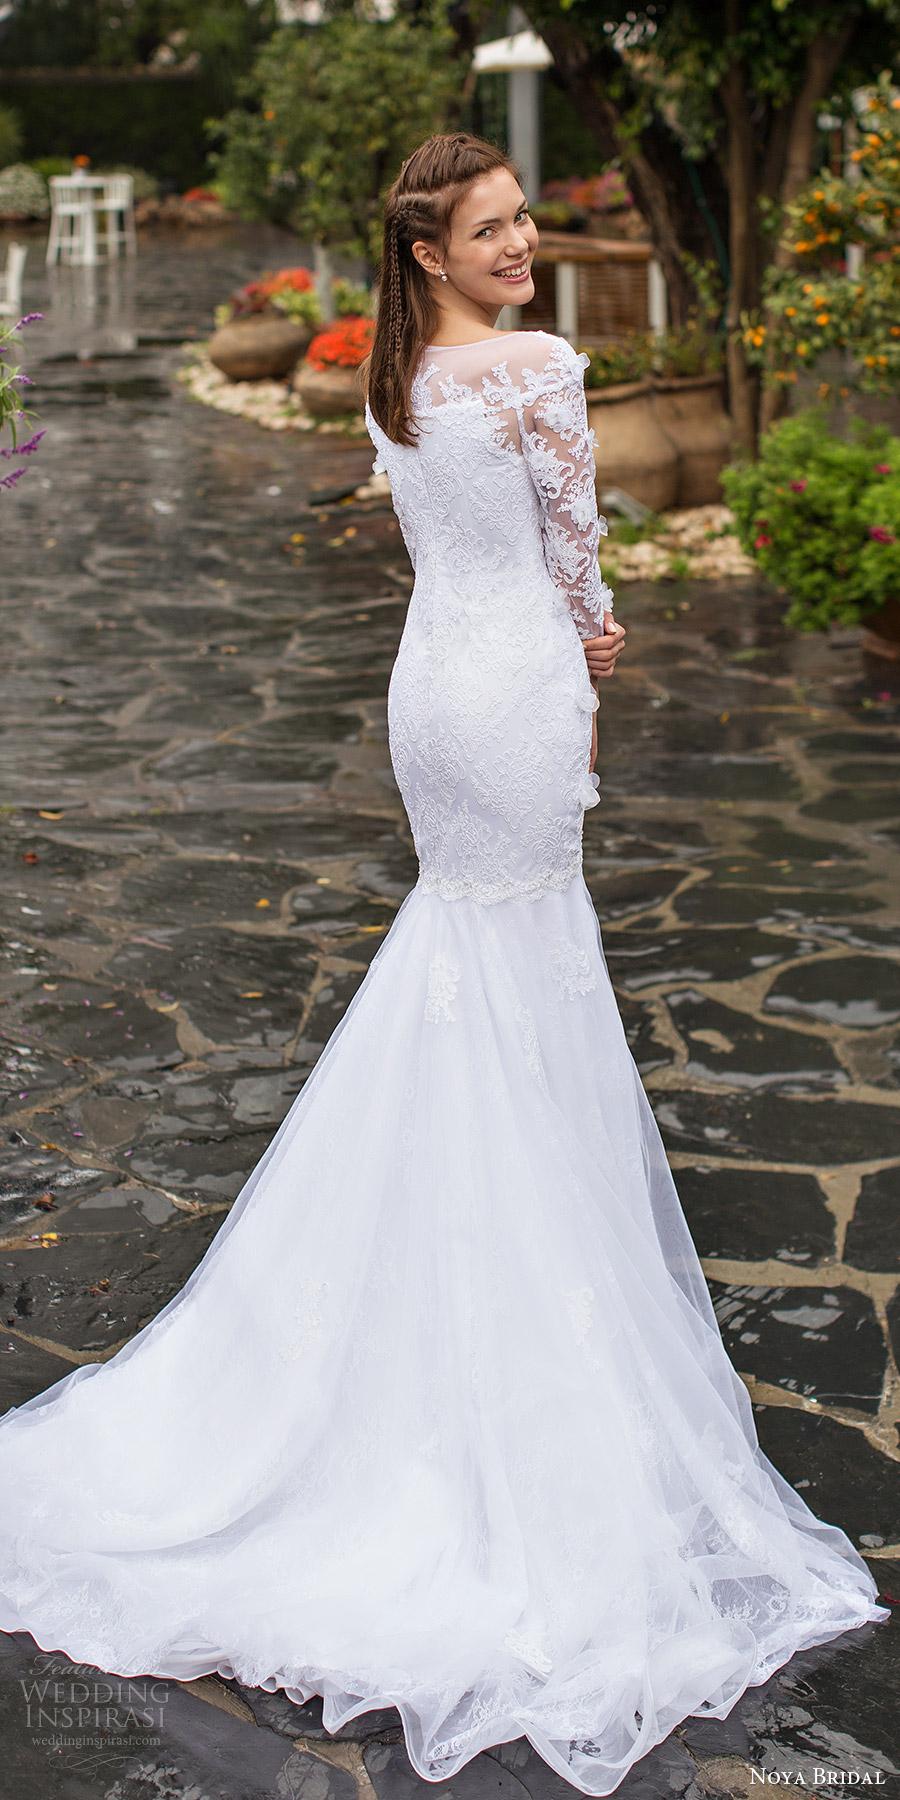 noya bridal 2016 long sleeves sweethart illusion bateau neck fit flare wedding dress (1204) bv elegant romantic